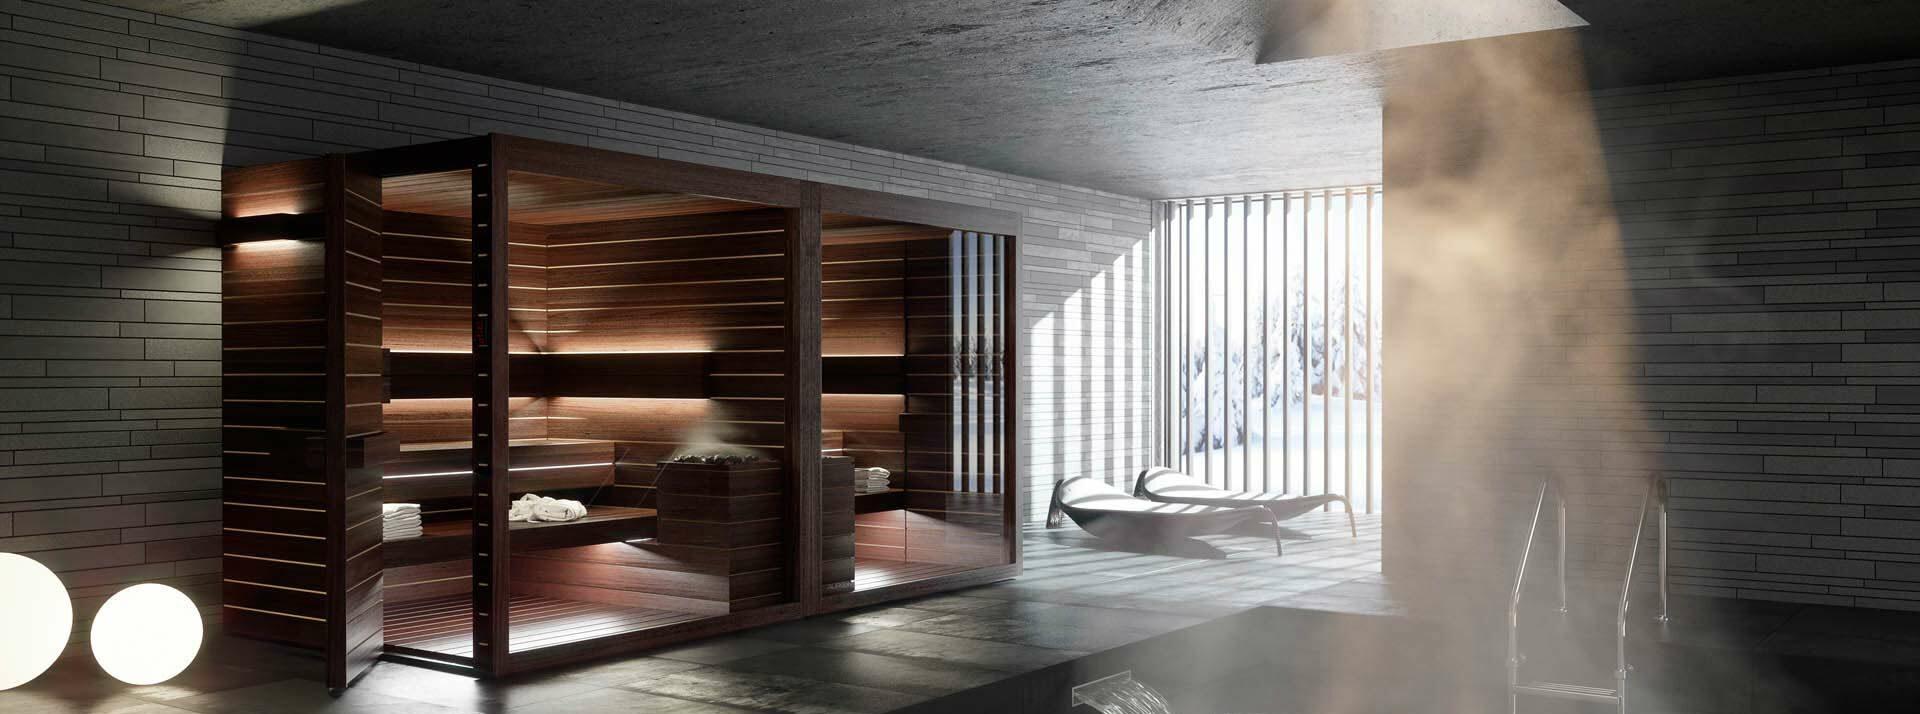 Sauna Interieur Bois Design Lumina Auroom